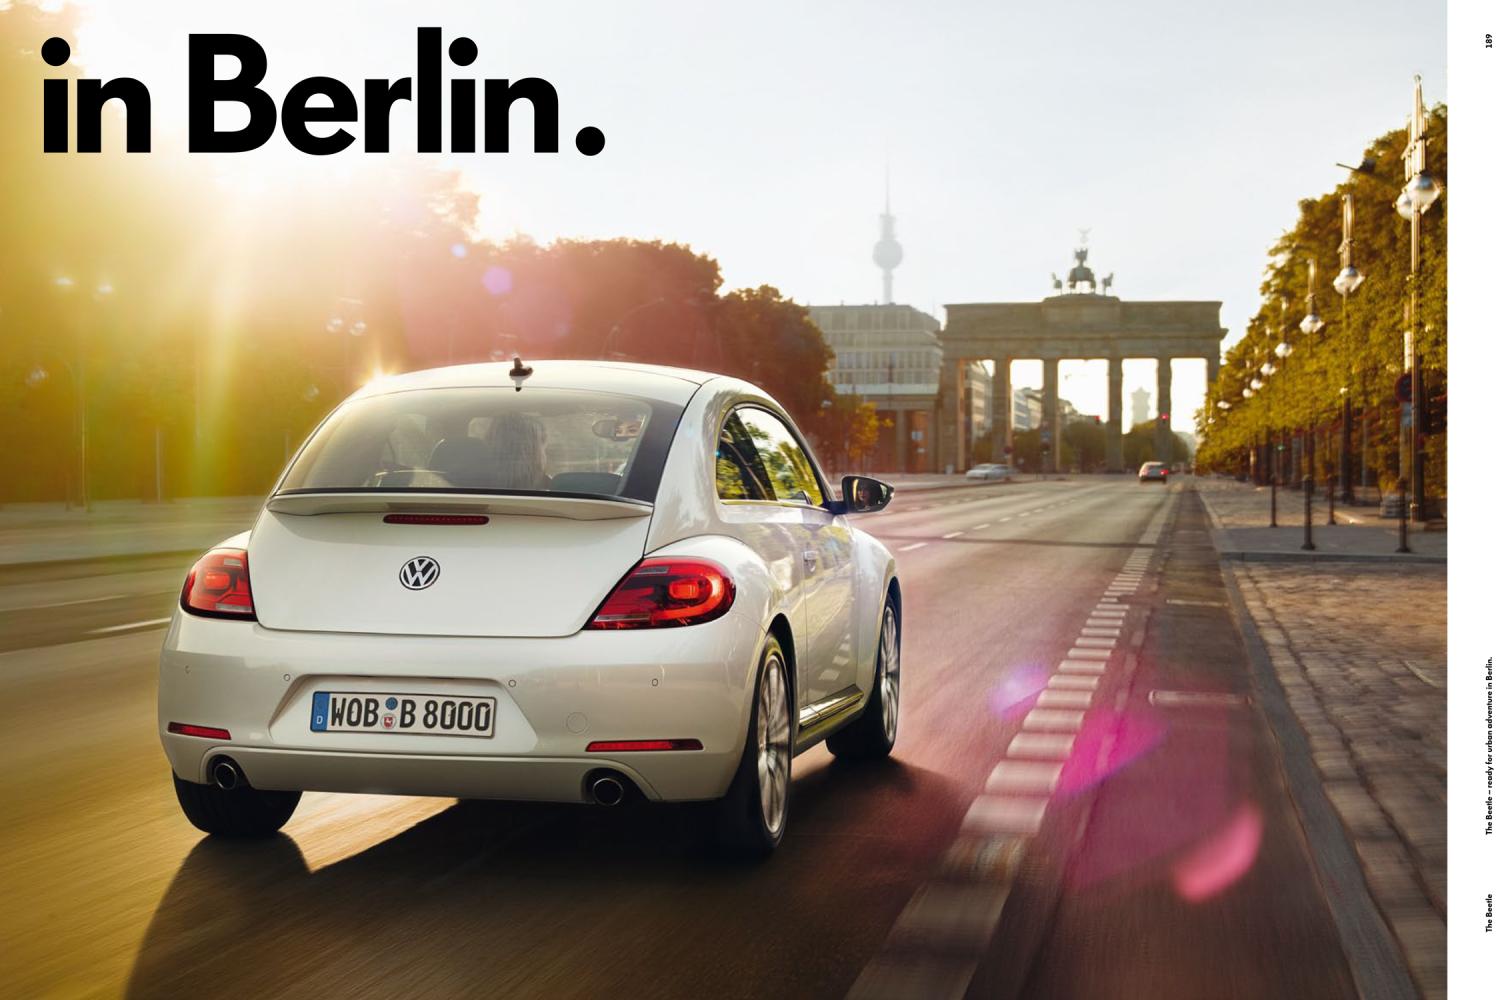 Rene_Staud_VW_Beetle_4